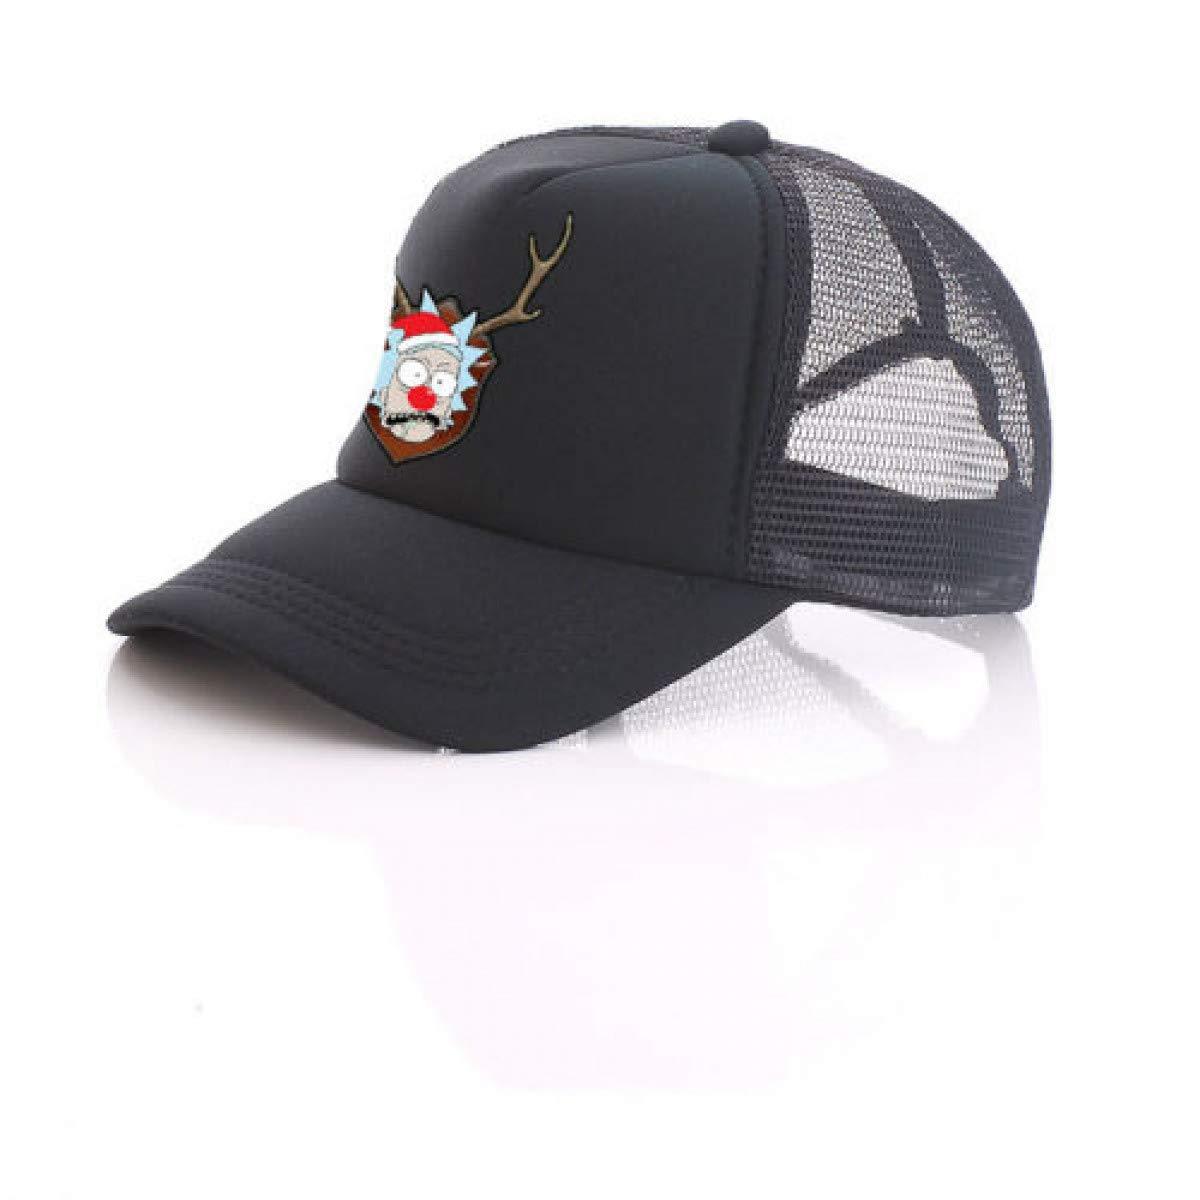 Amazon.com: HOMZE and Morty Pickle Rick Christmas Rick Printing Black Mesh Trucker Cap Baseball Cap Cartoon Hat Cosplay Costume Unisex Cool C: Home & ...